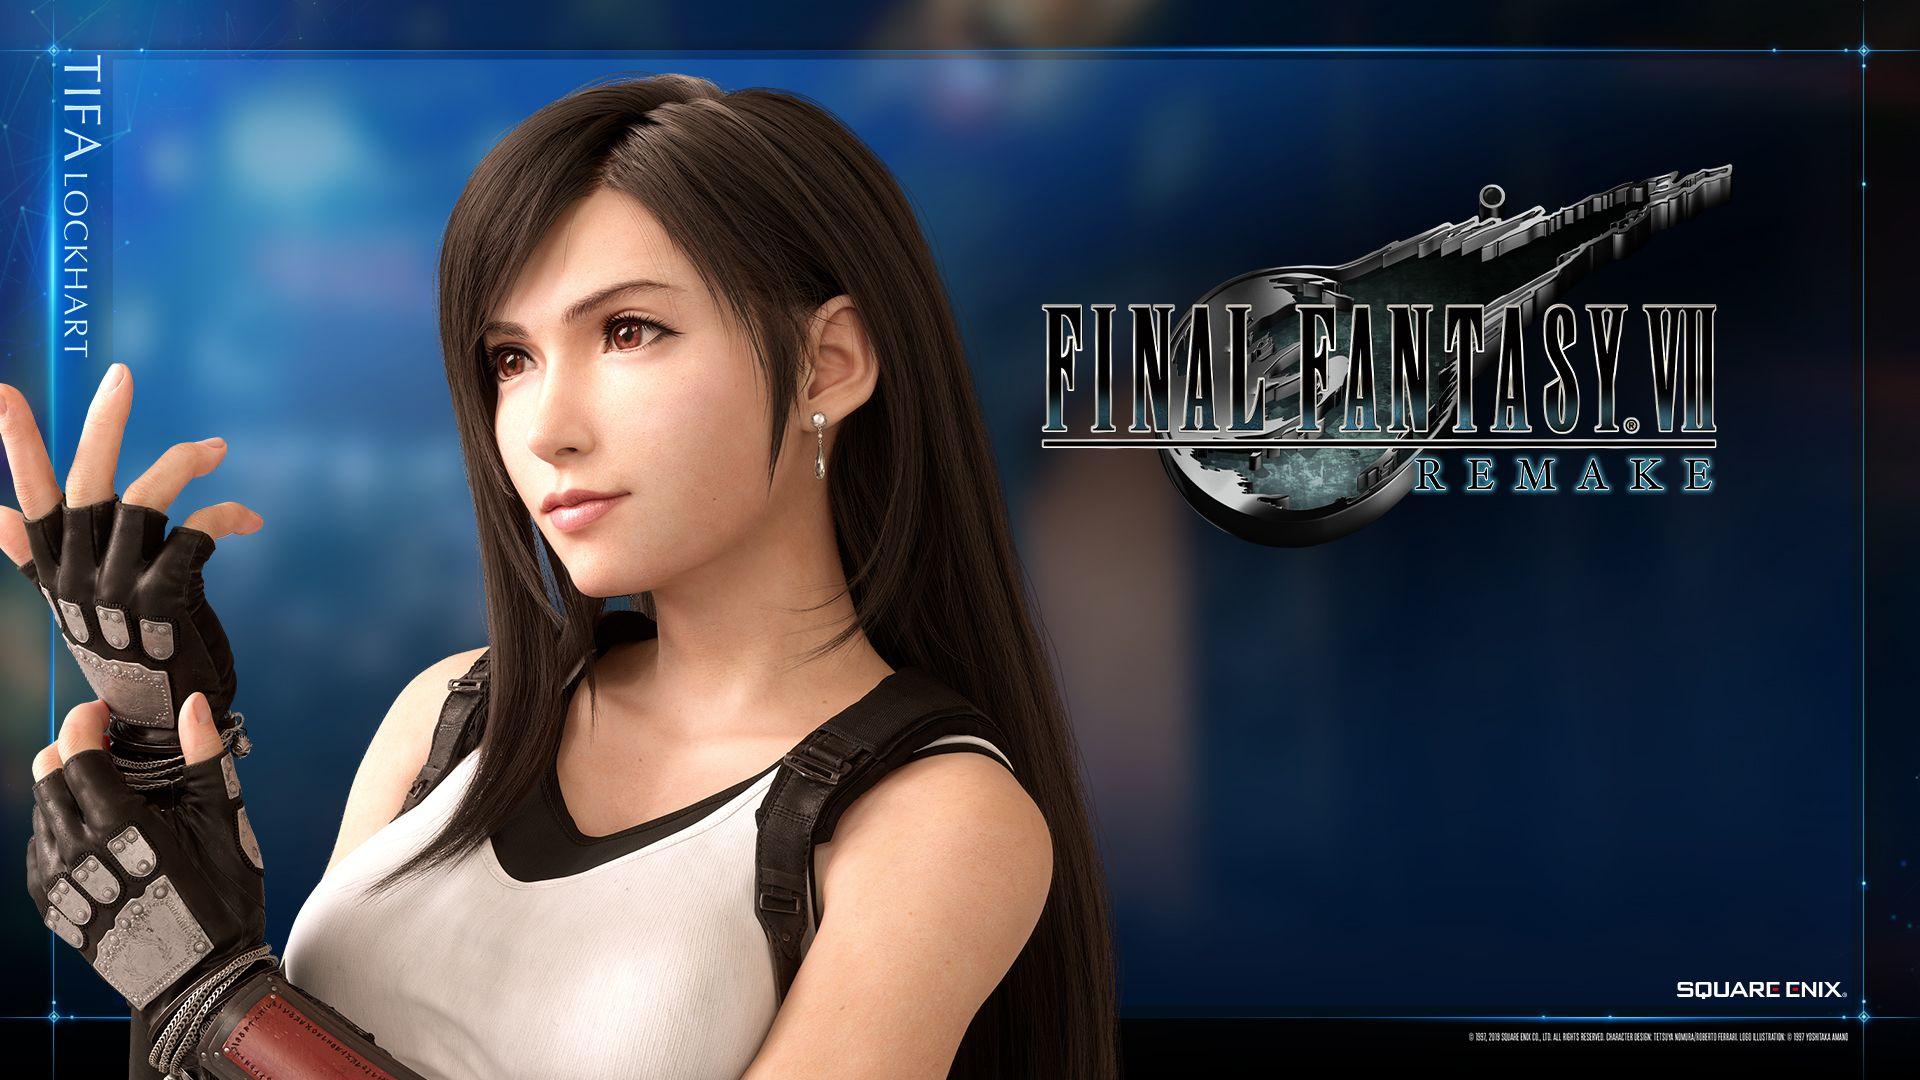 Tifa Final Fantasy 7 Remake Wallpapers Wallpaper Cave